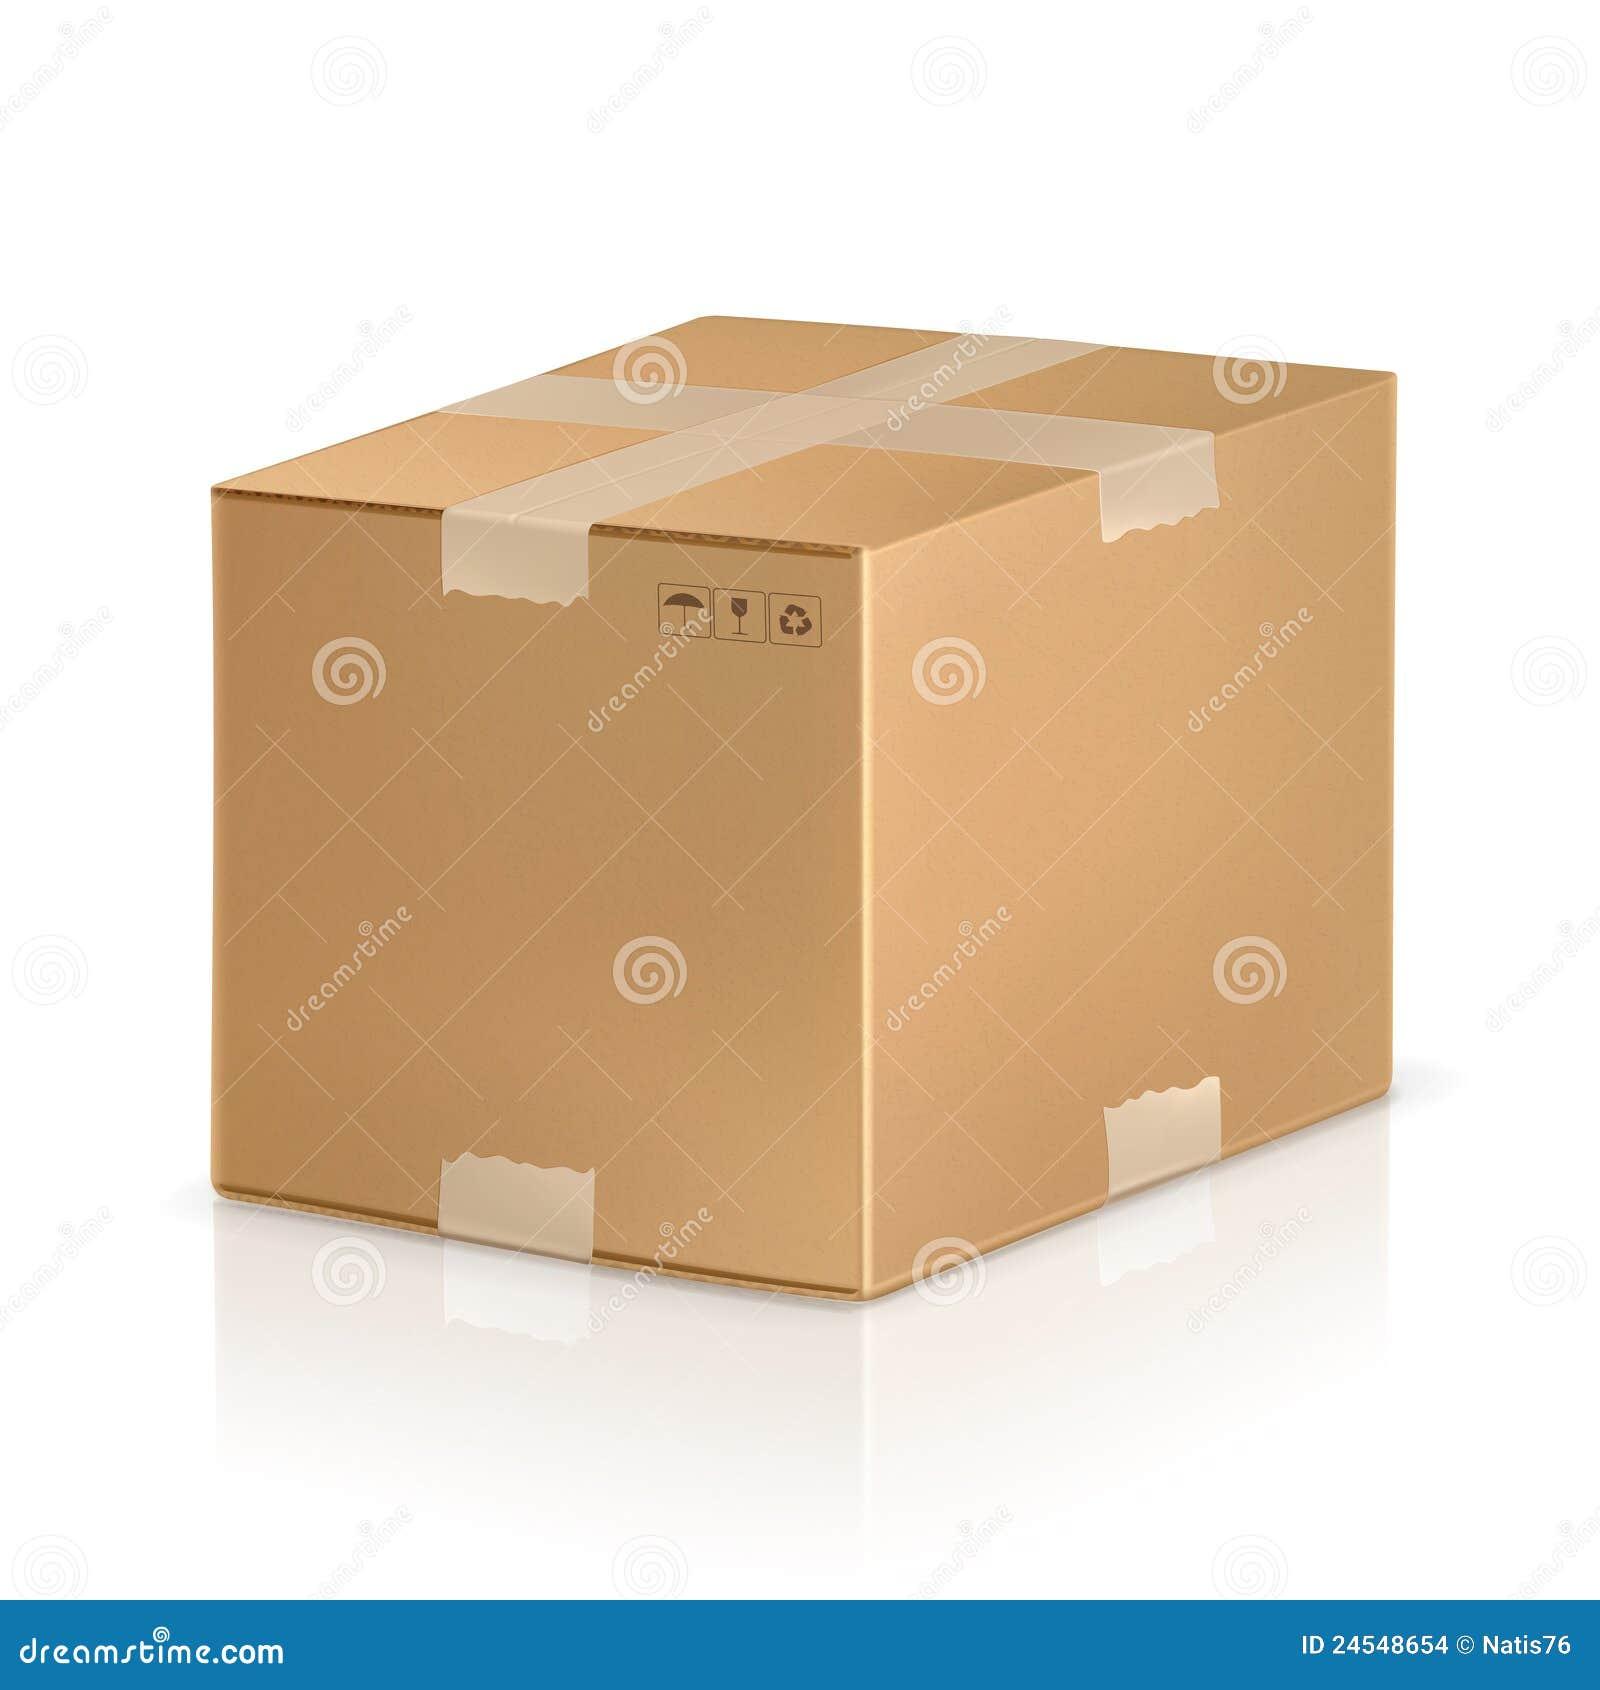 Caixa da caixa